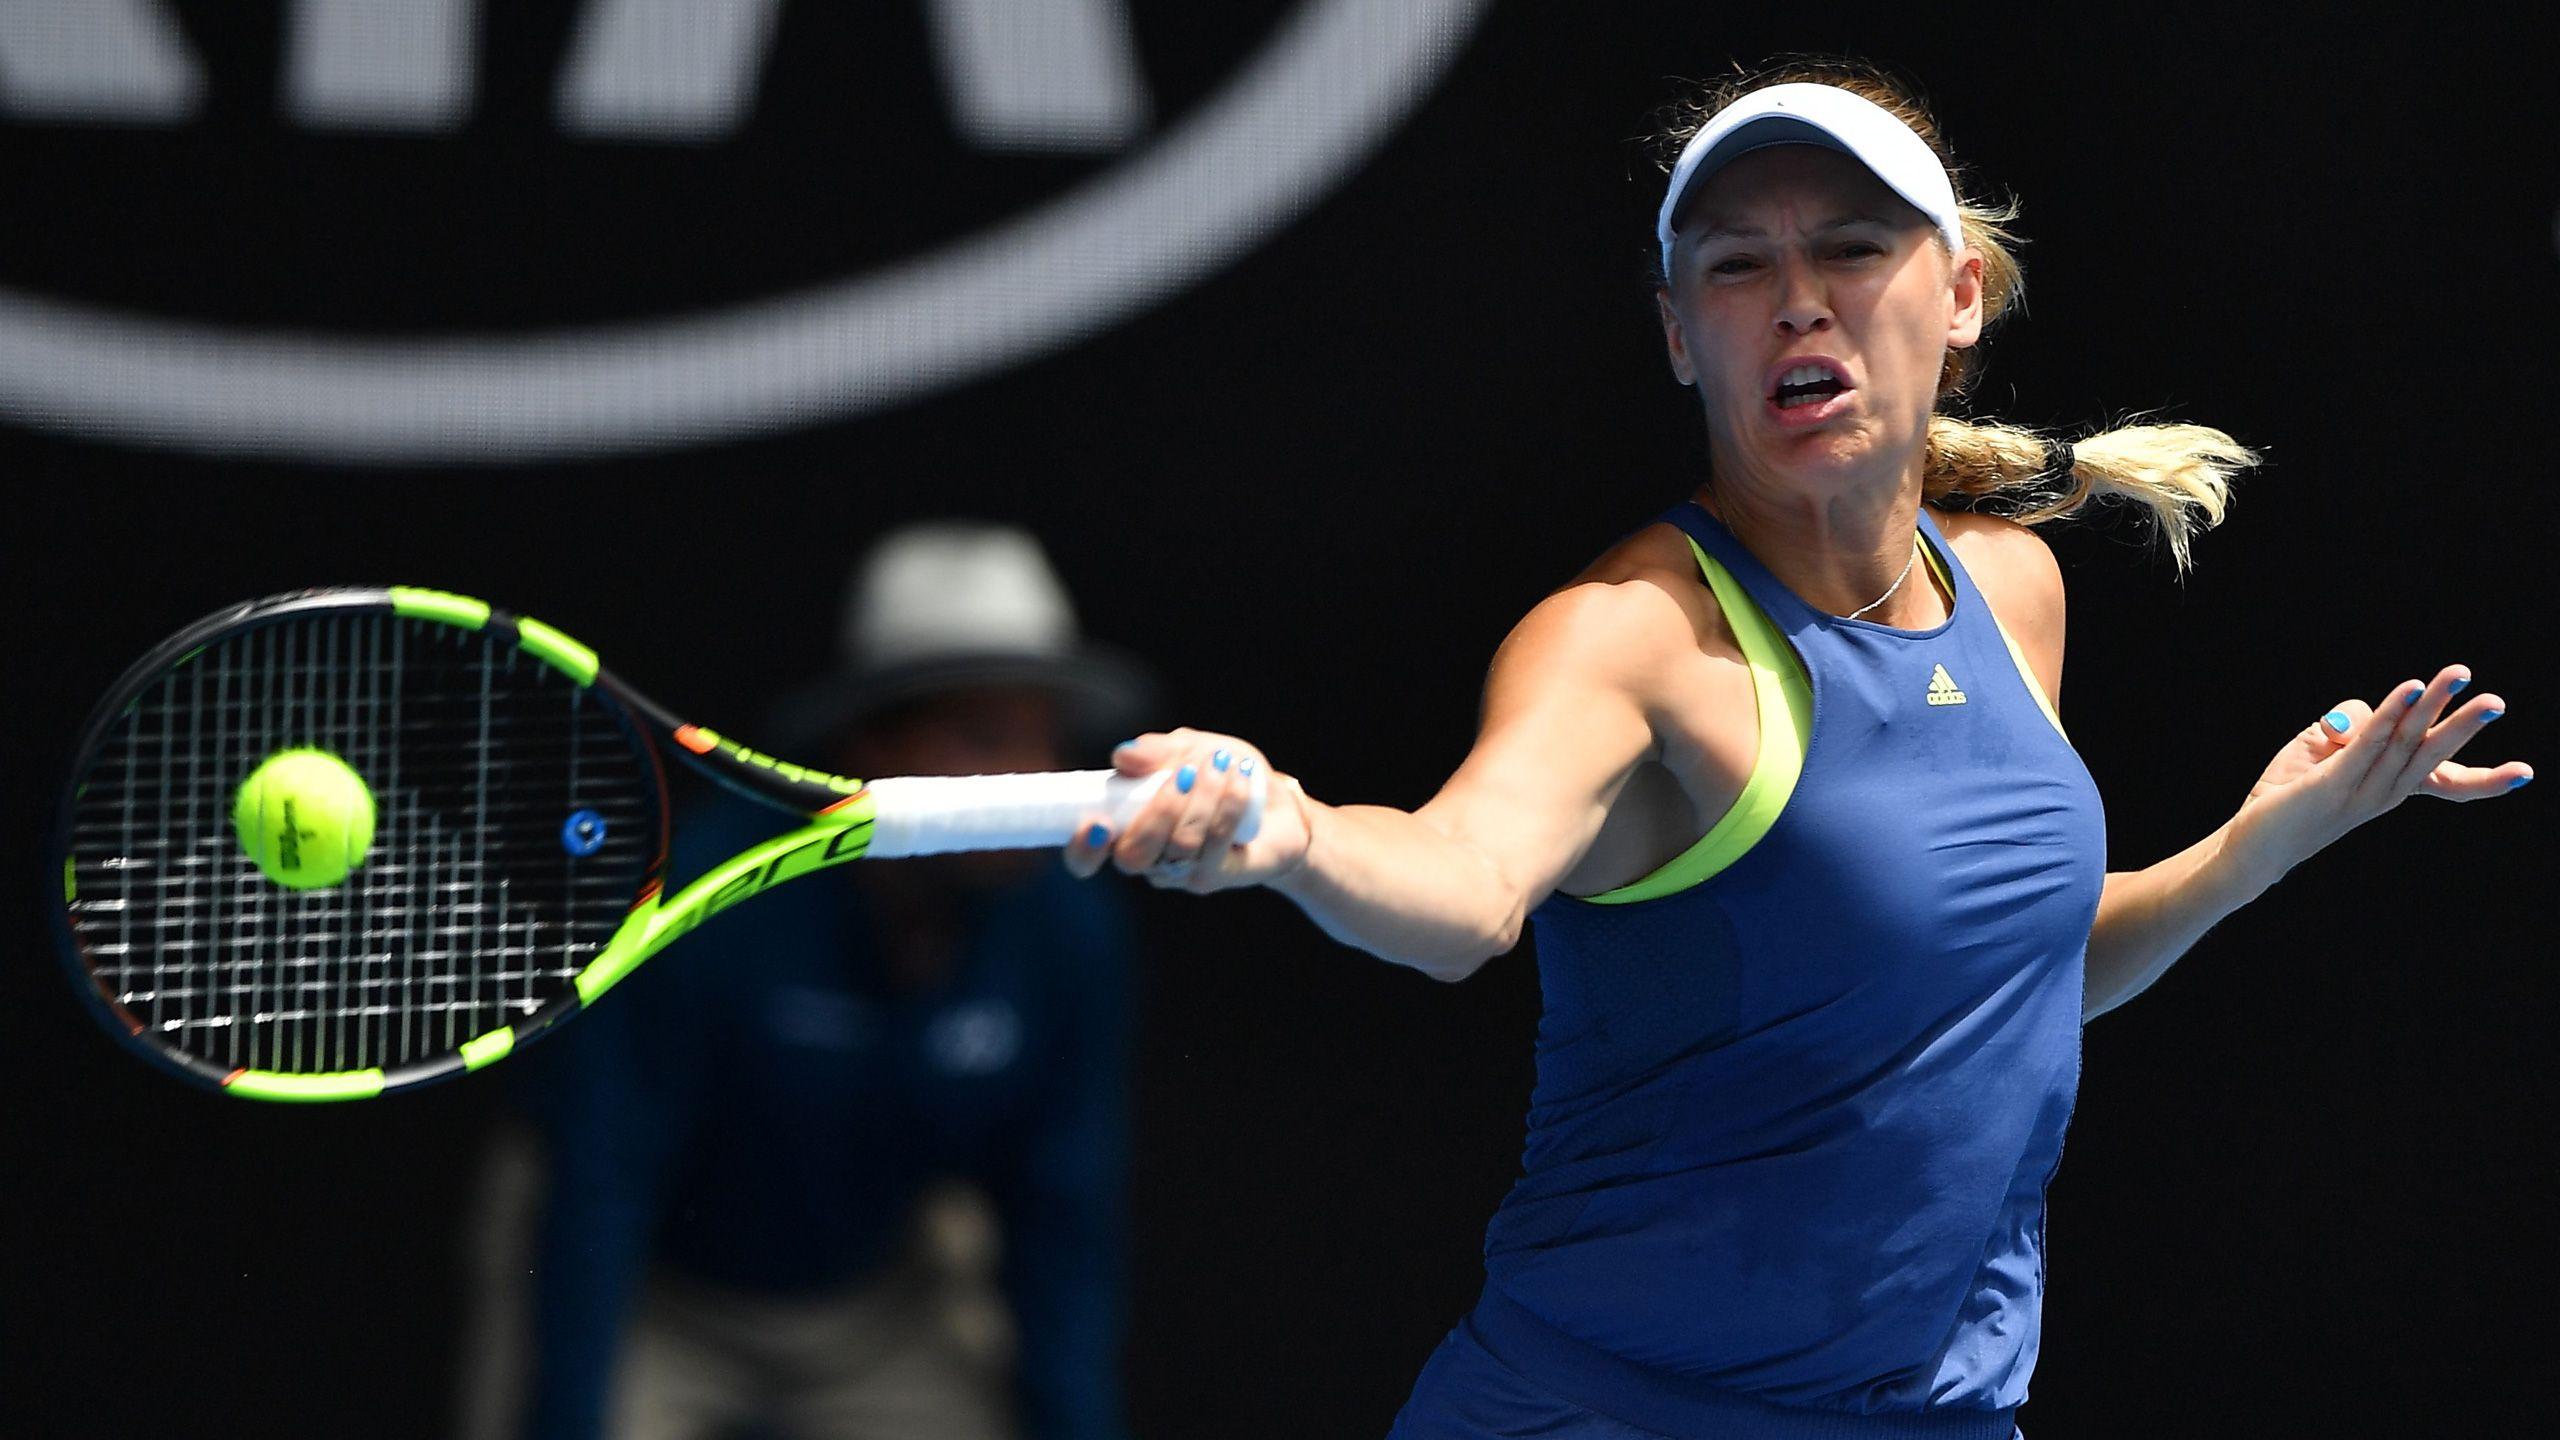 (2) Wozniacki vs. Suarez Navarro (Women's Quarterfinals)